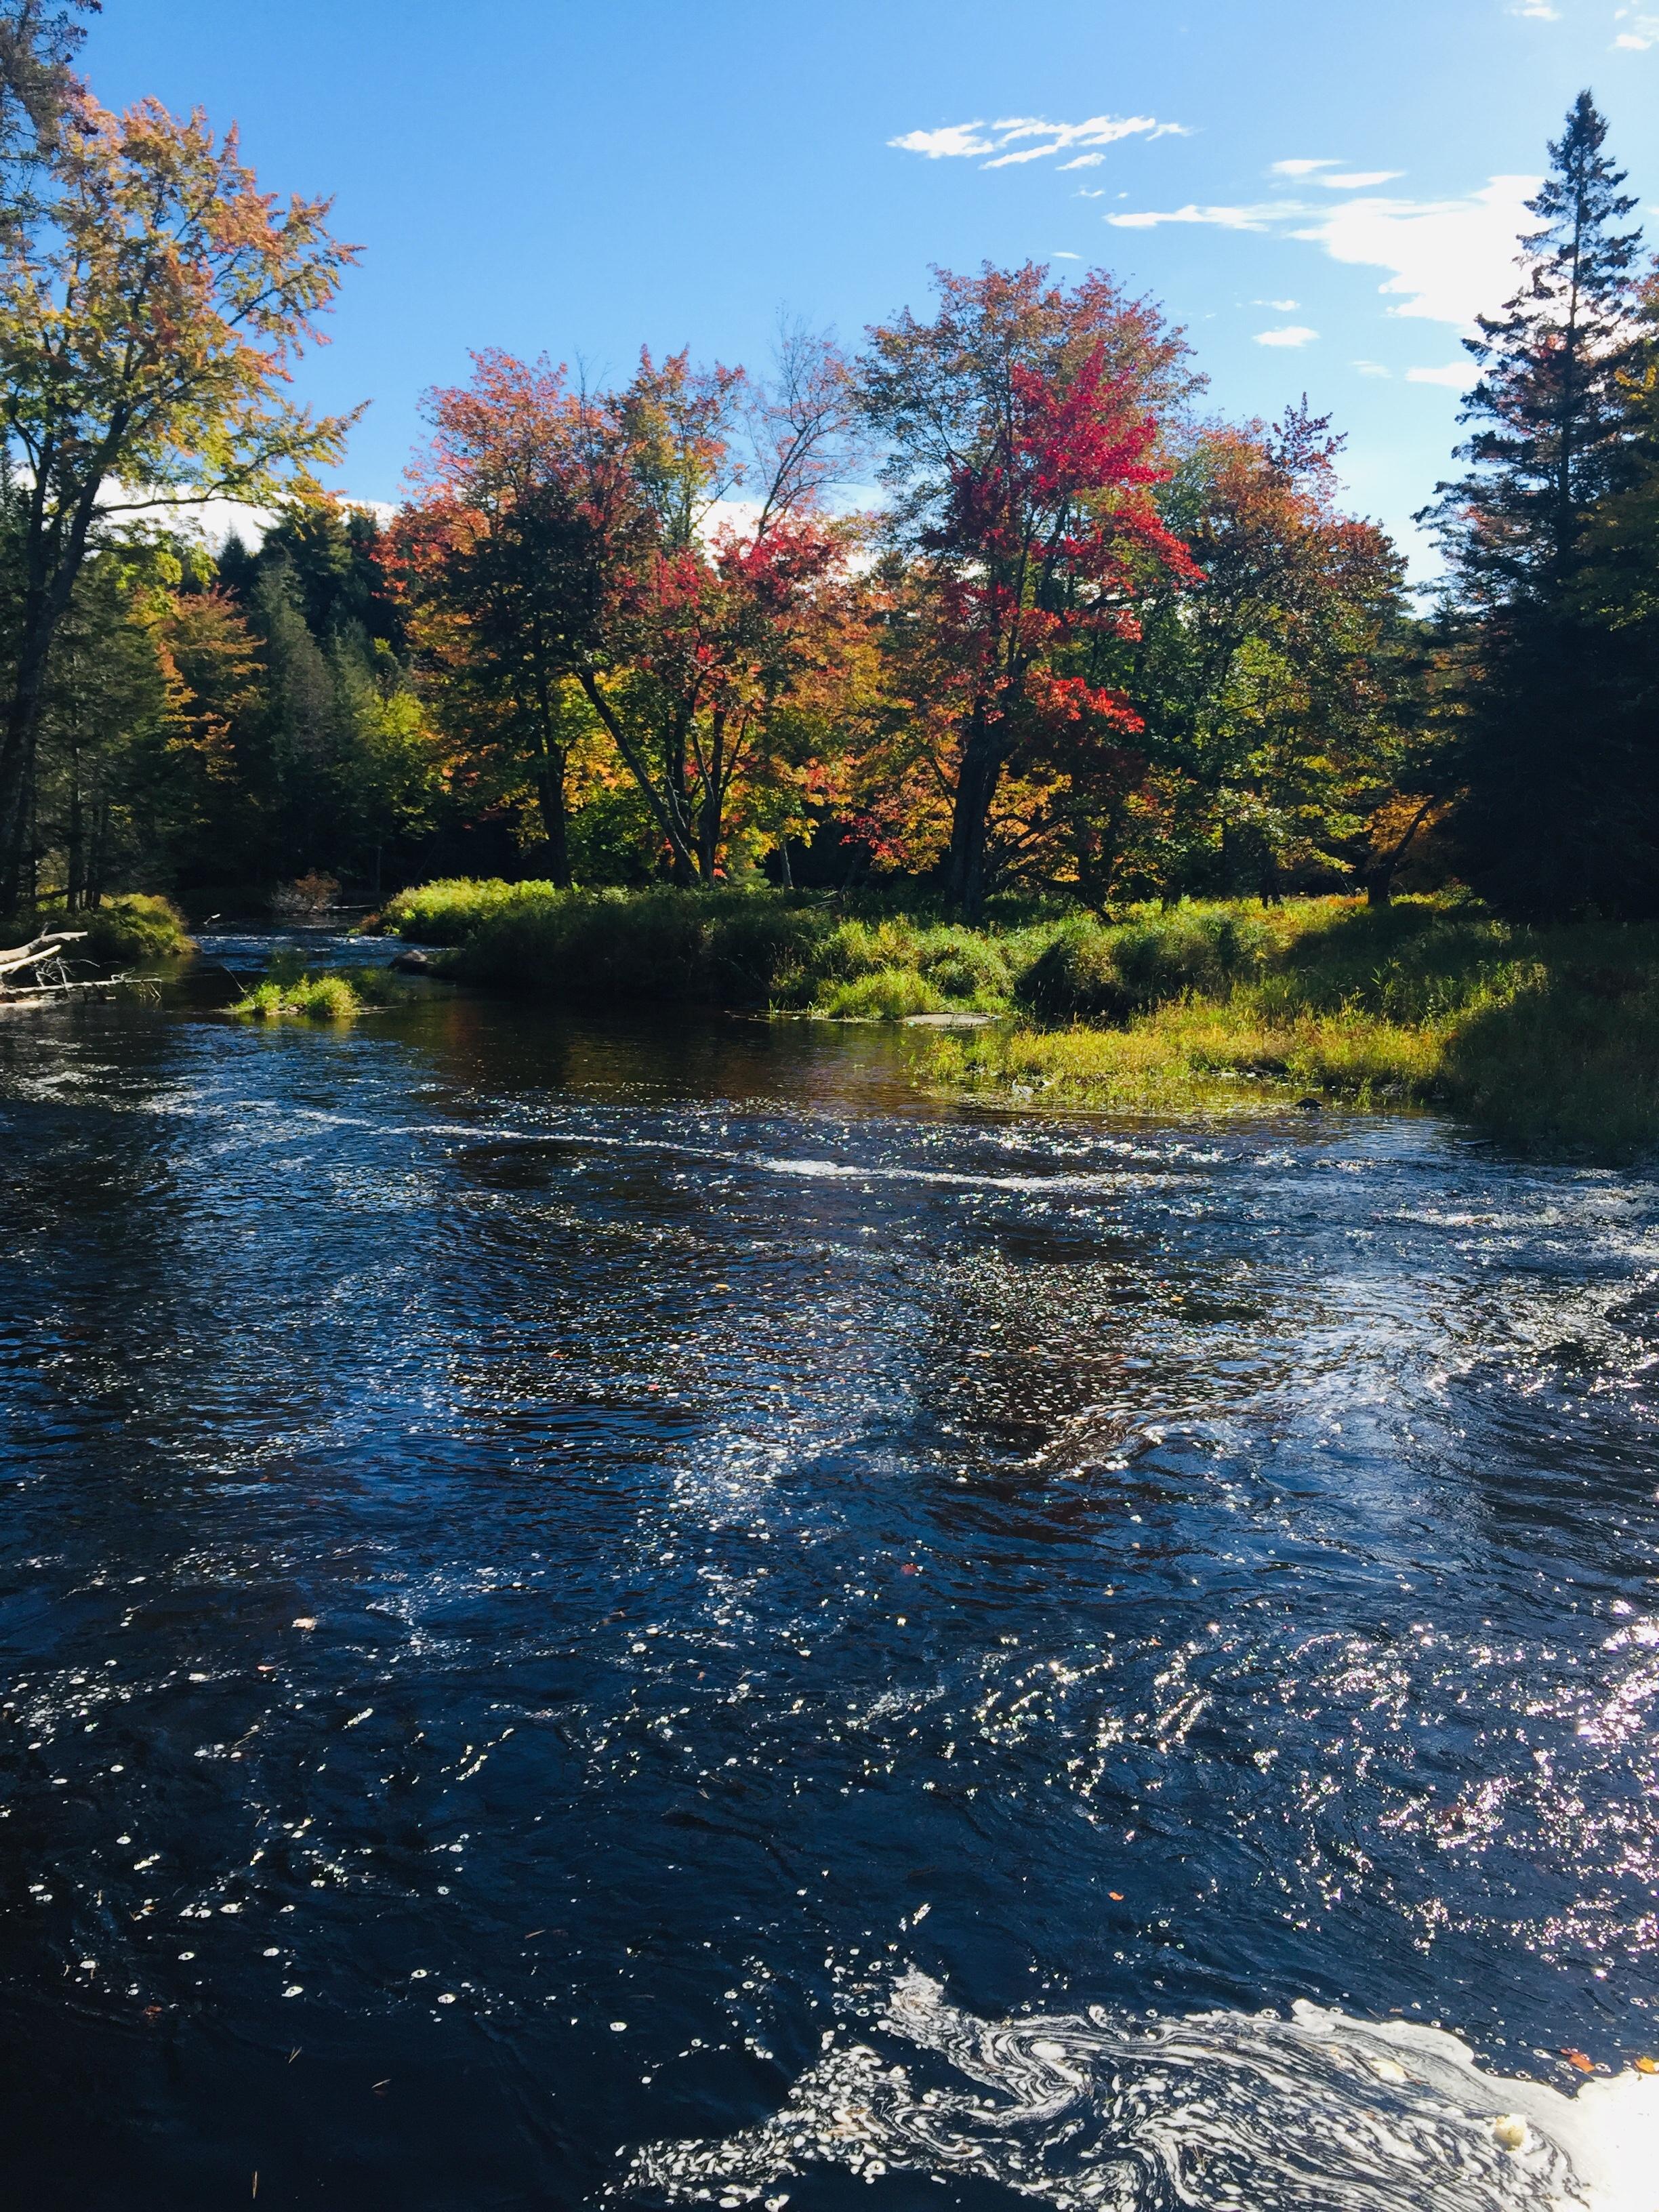 Union River, Mariaville Falls Preserve, ME